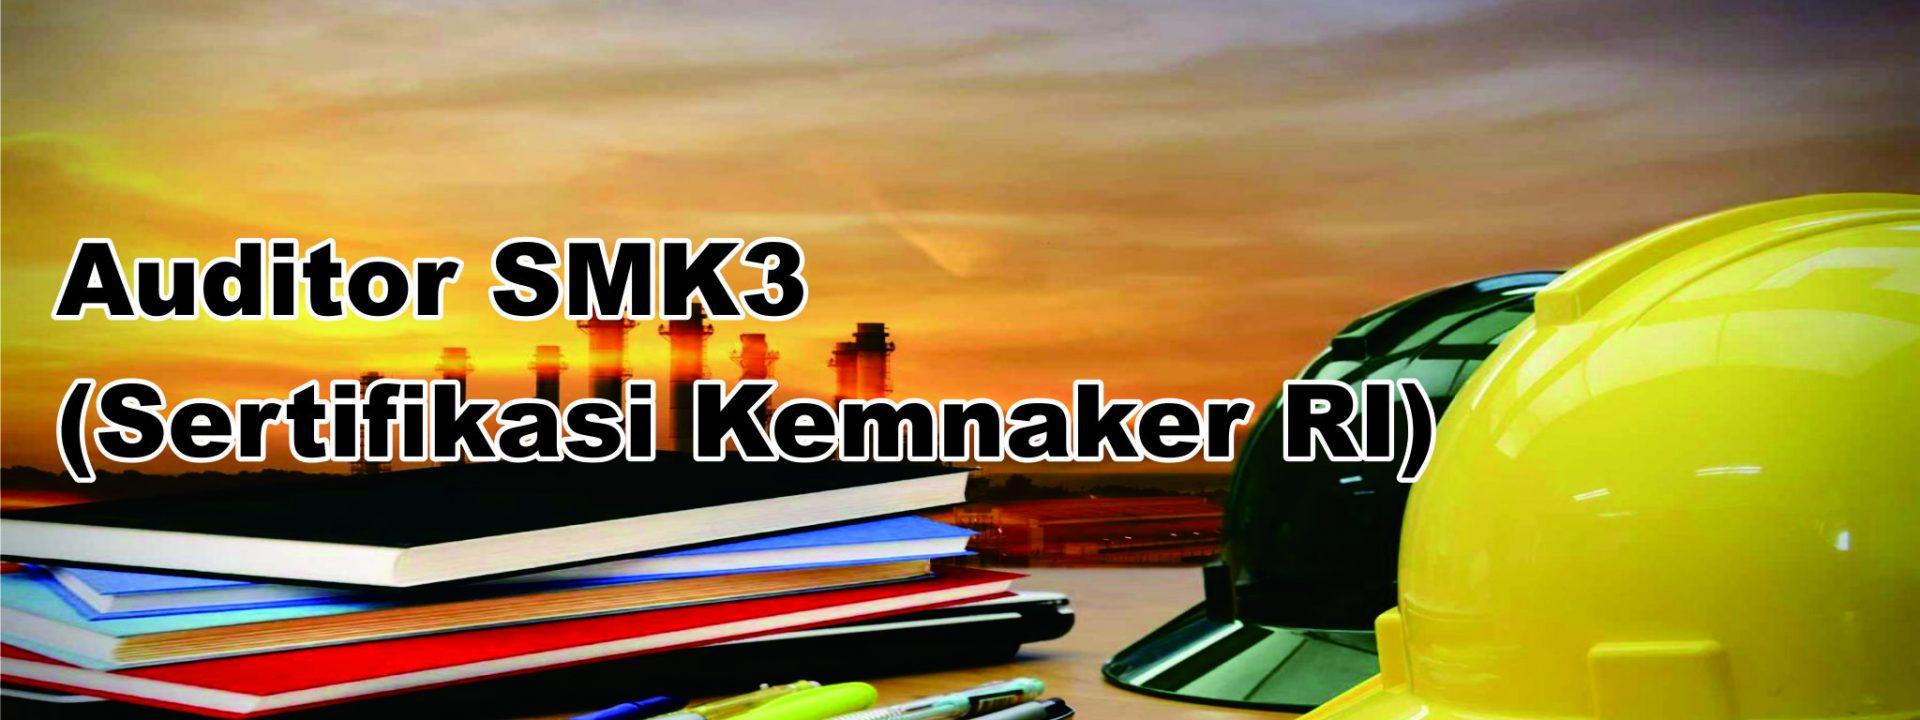 auditor smk3